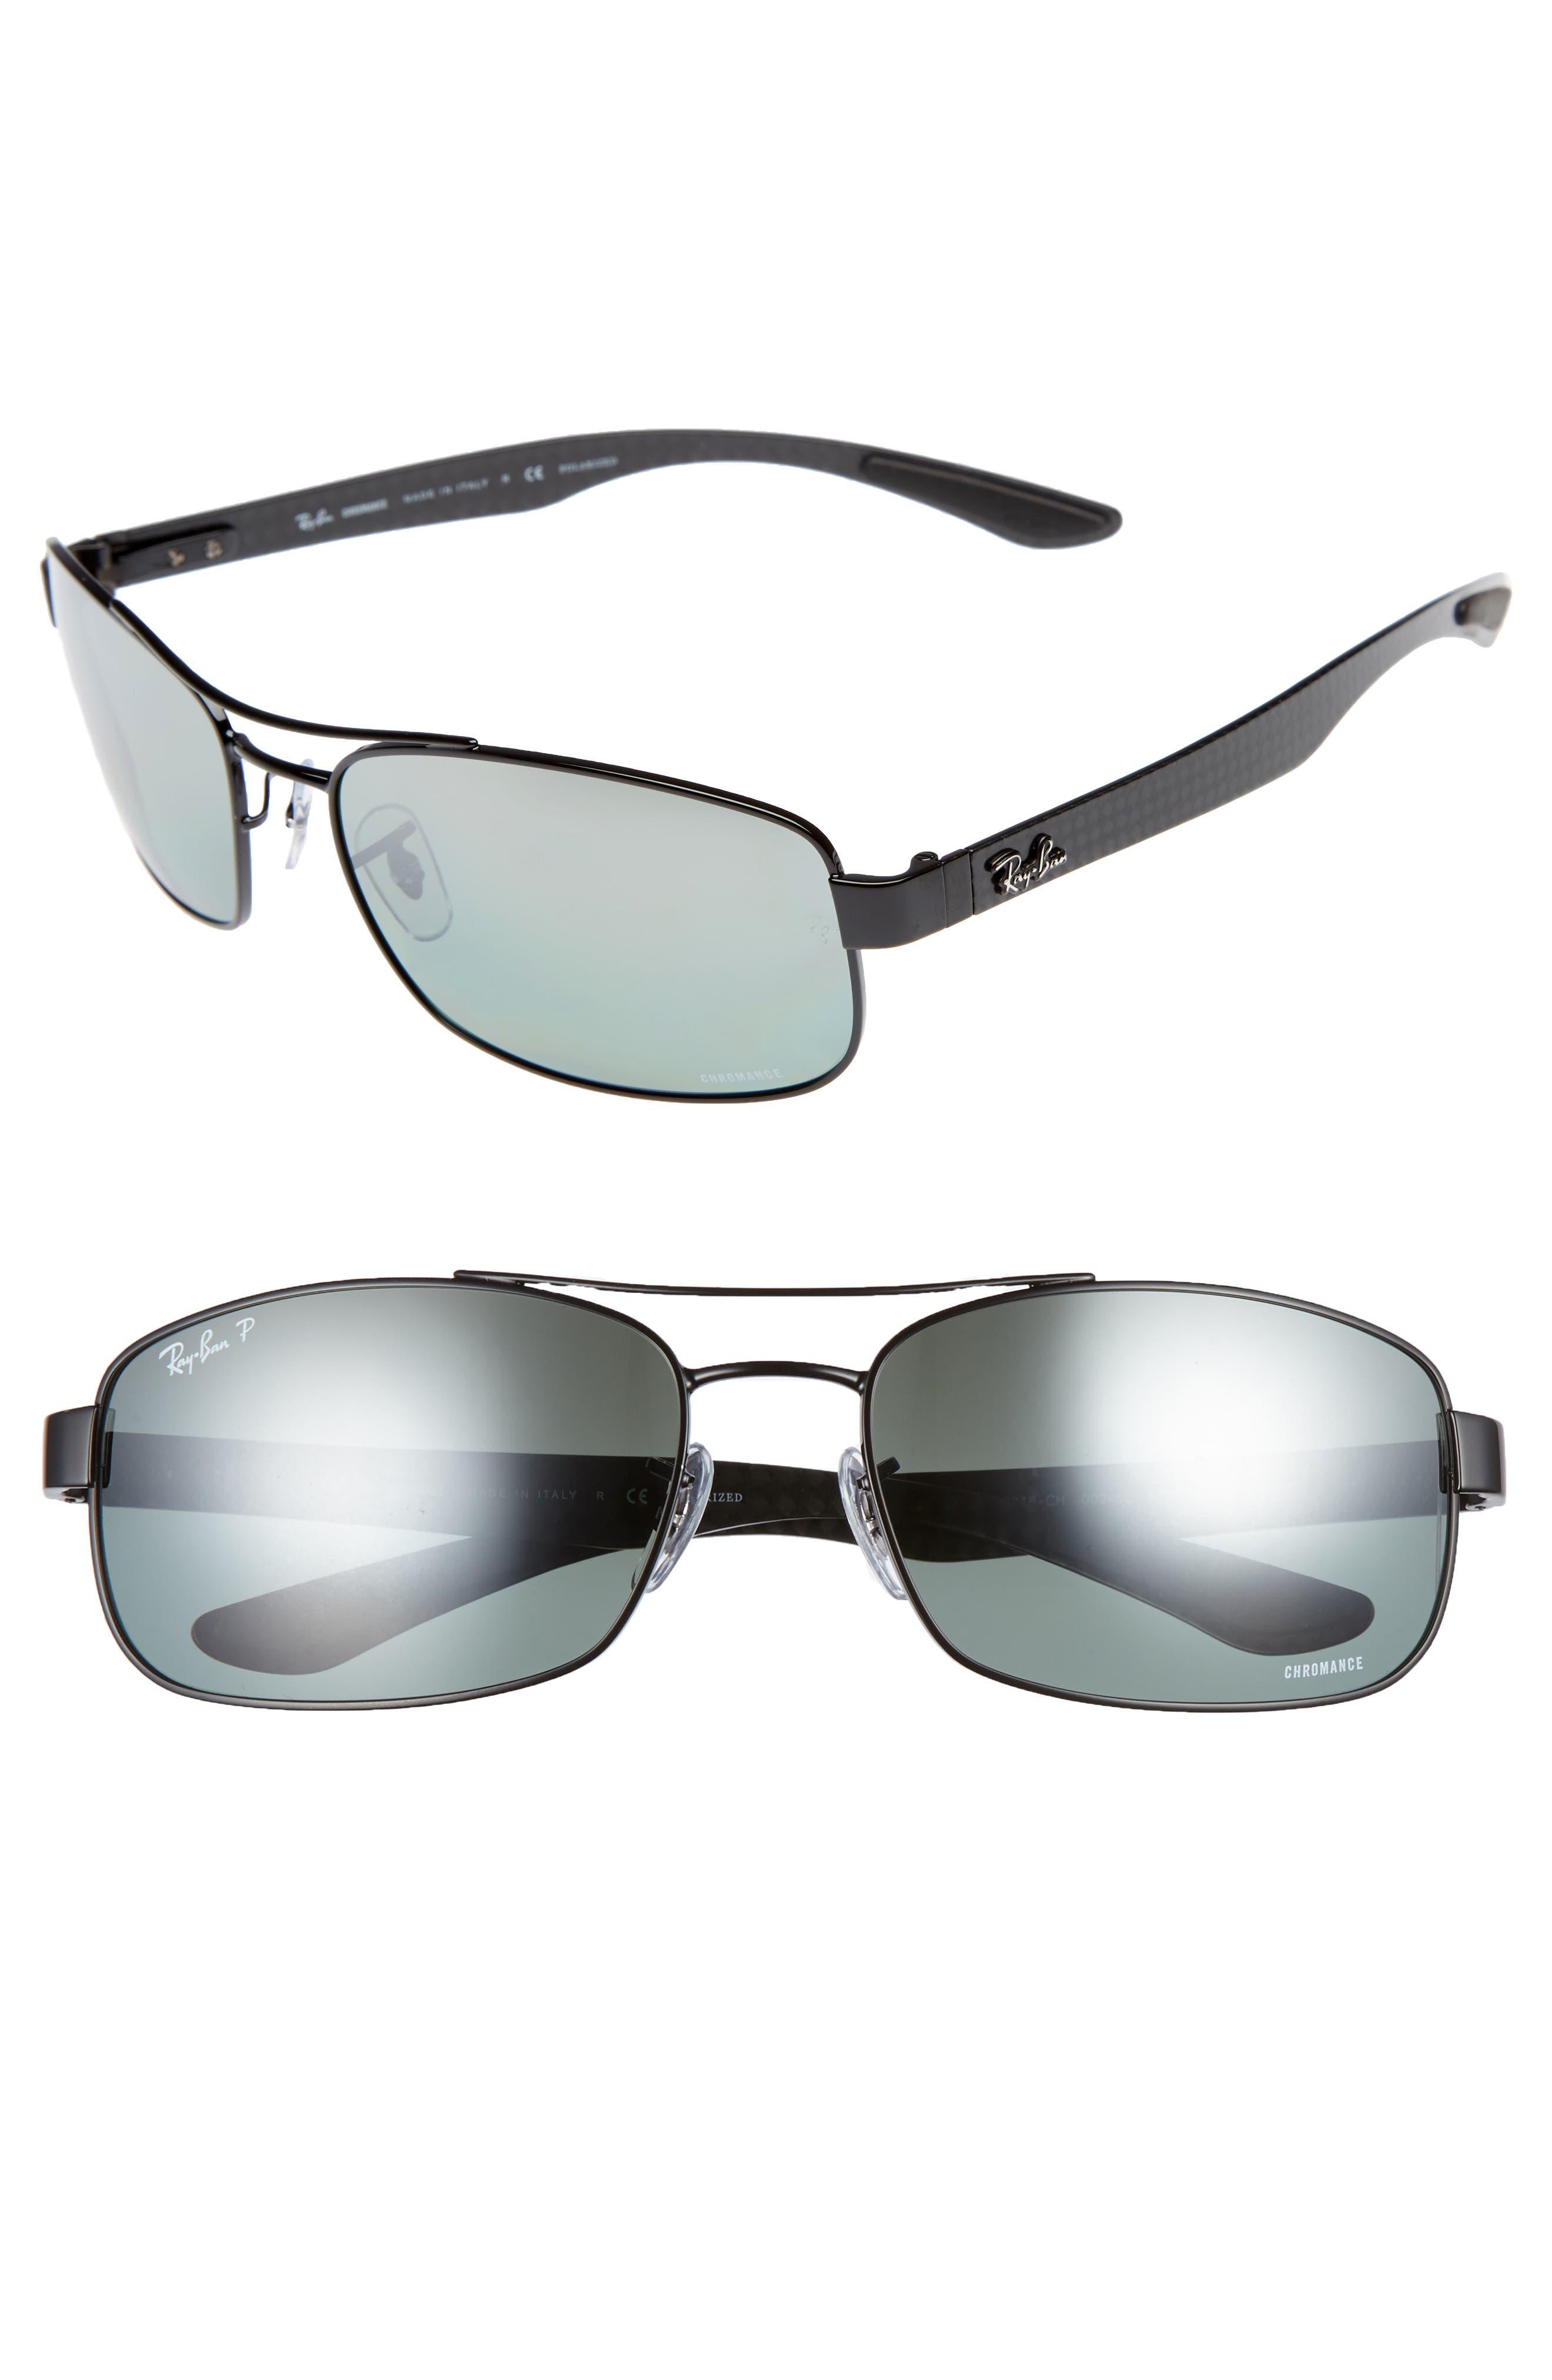 Ray-Ban Chromance 62mm Polarized Sunglasses